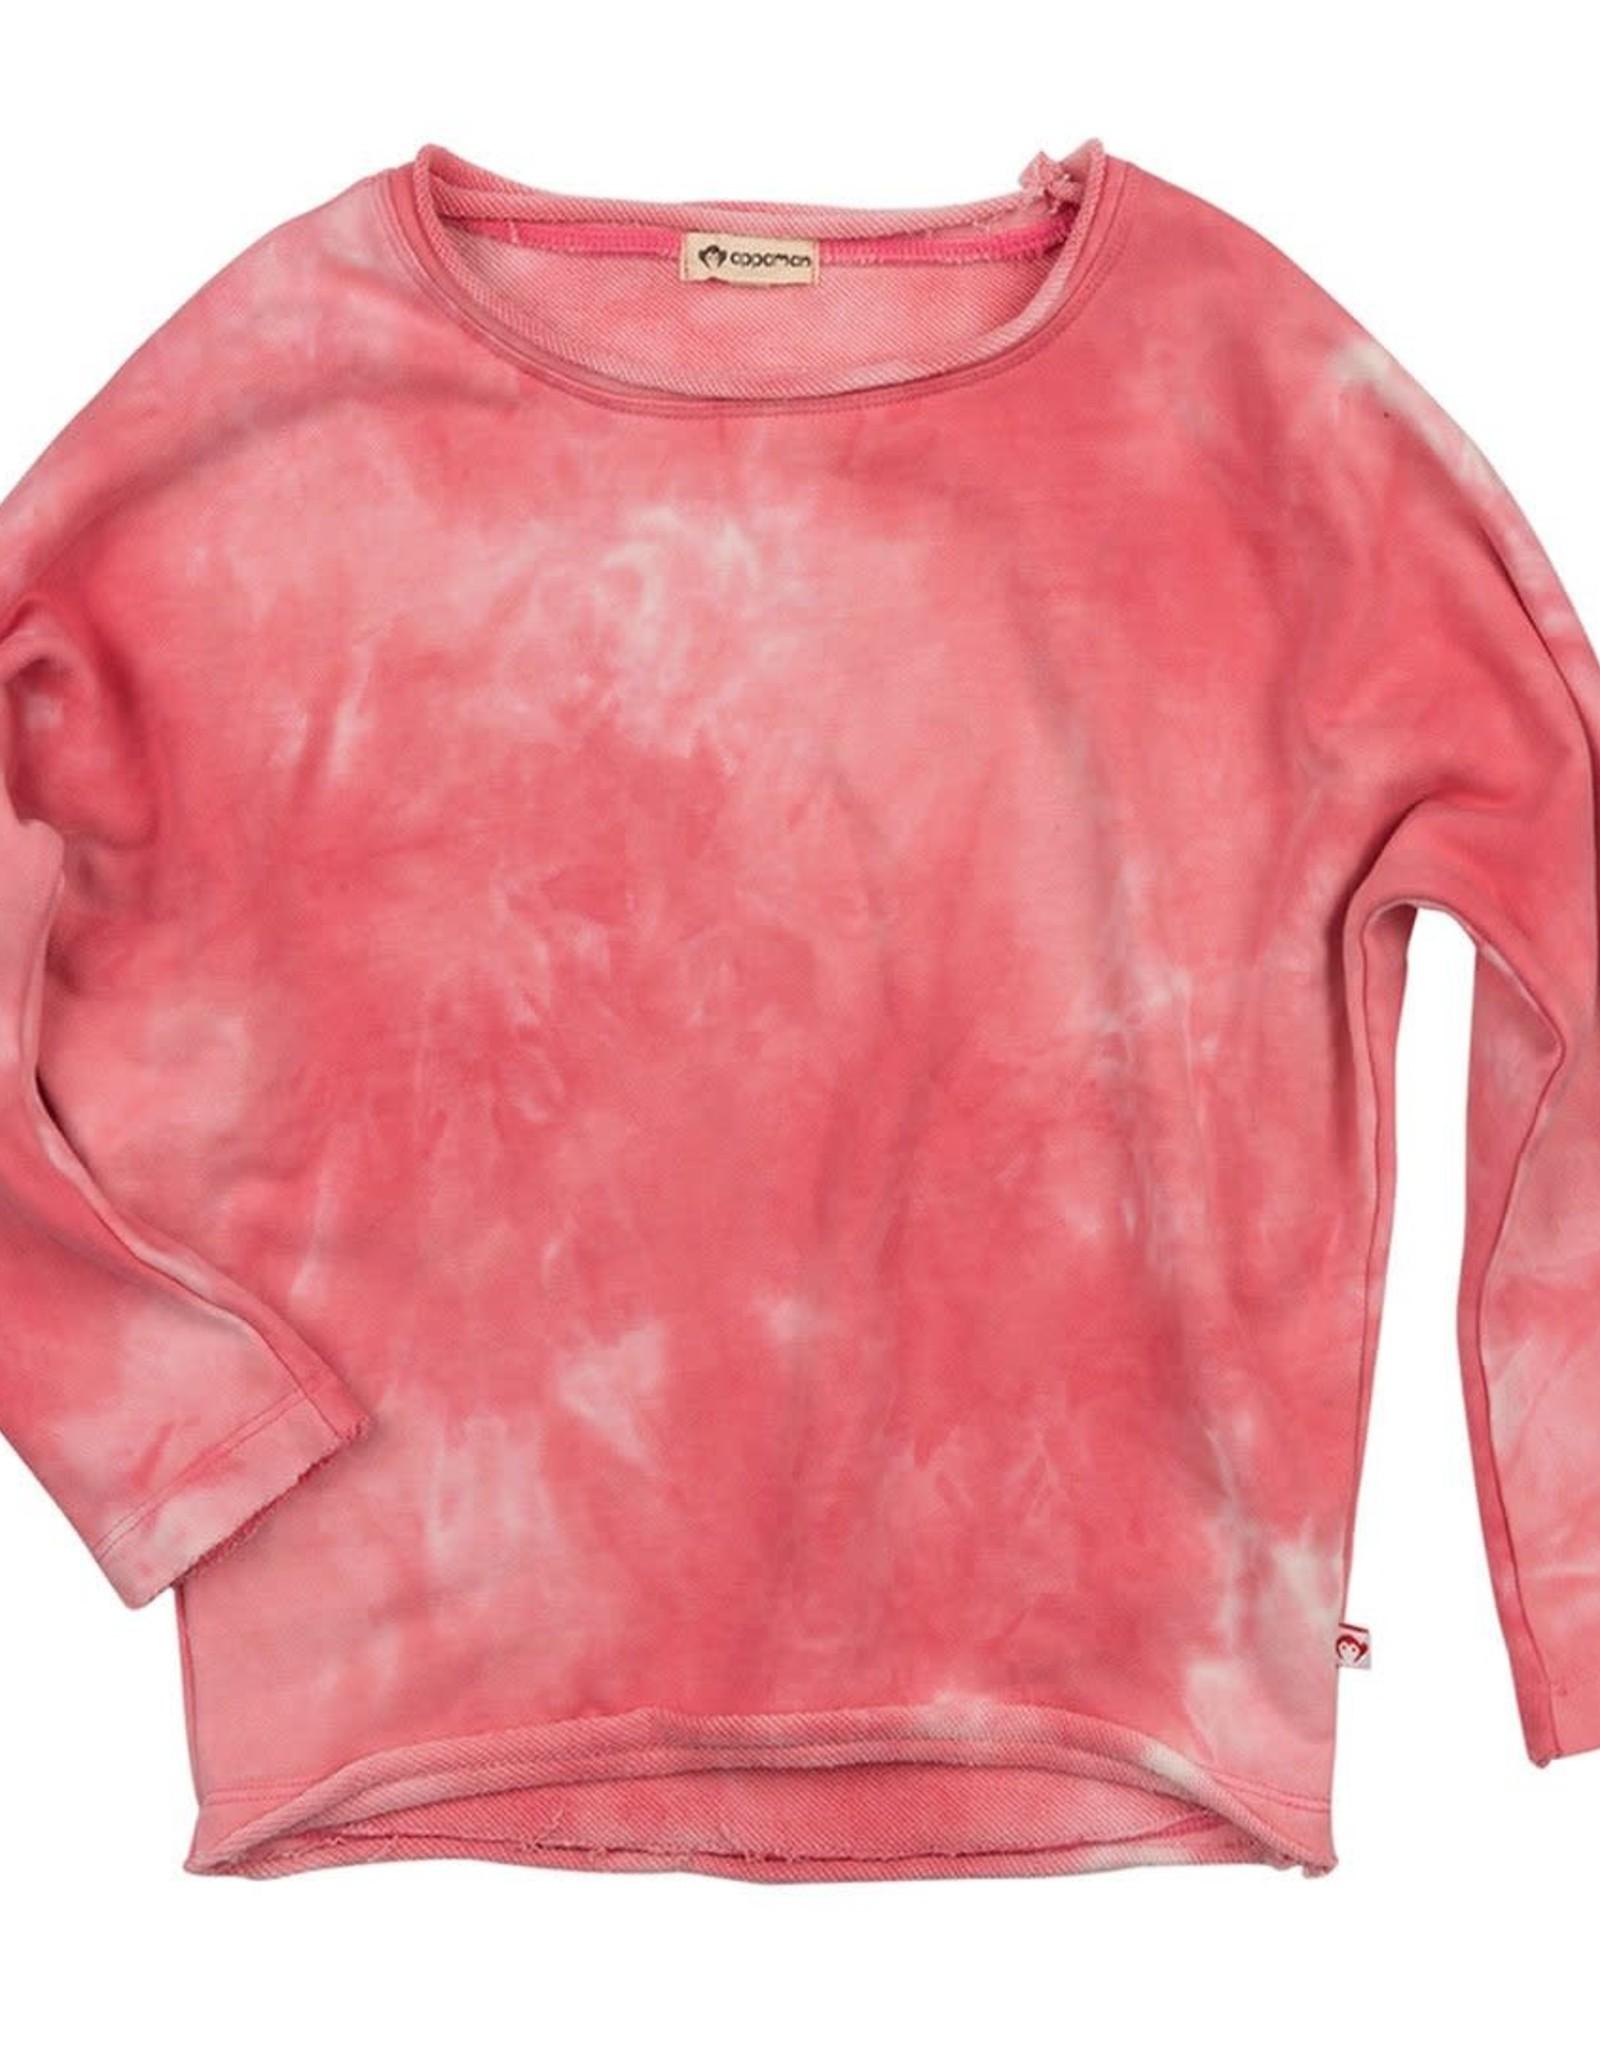 Appaman Slouchy Sweatshirt - Pink Tie Dye